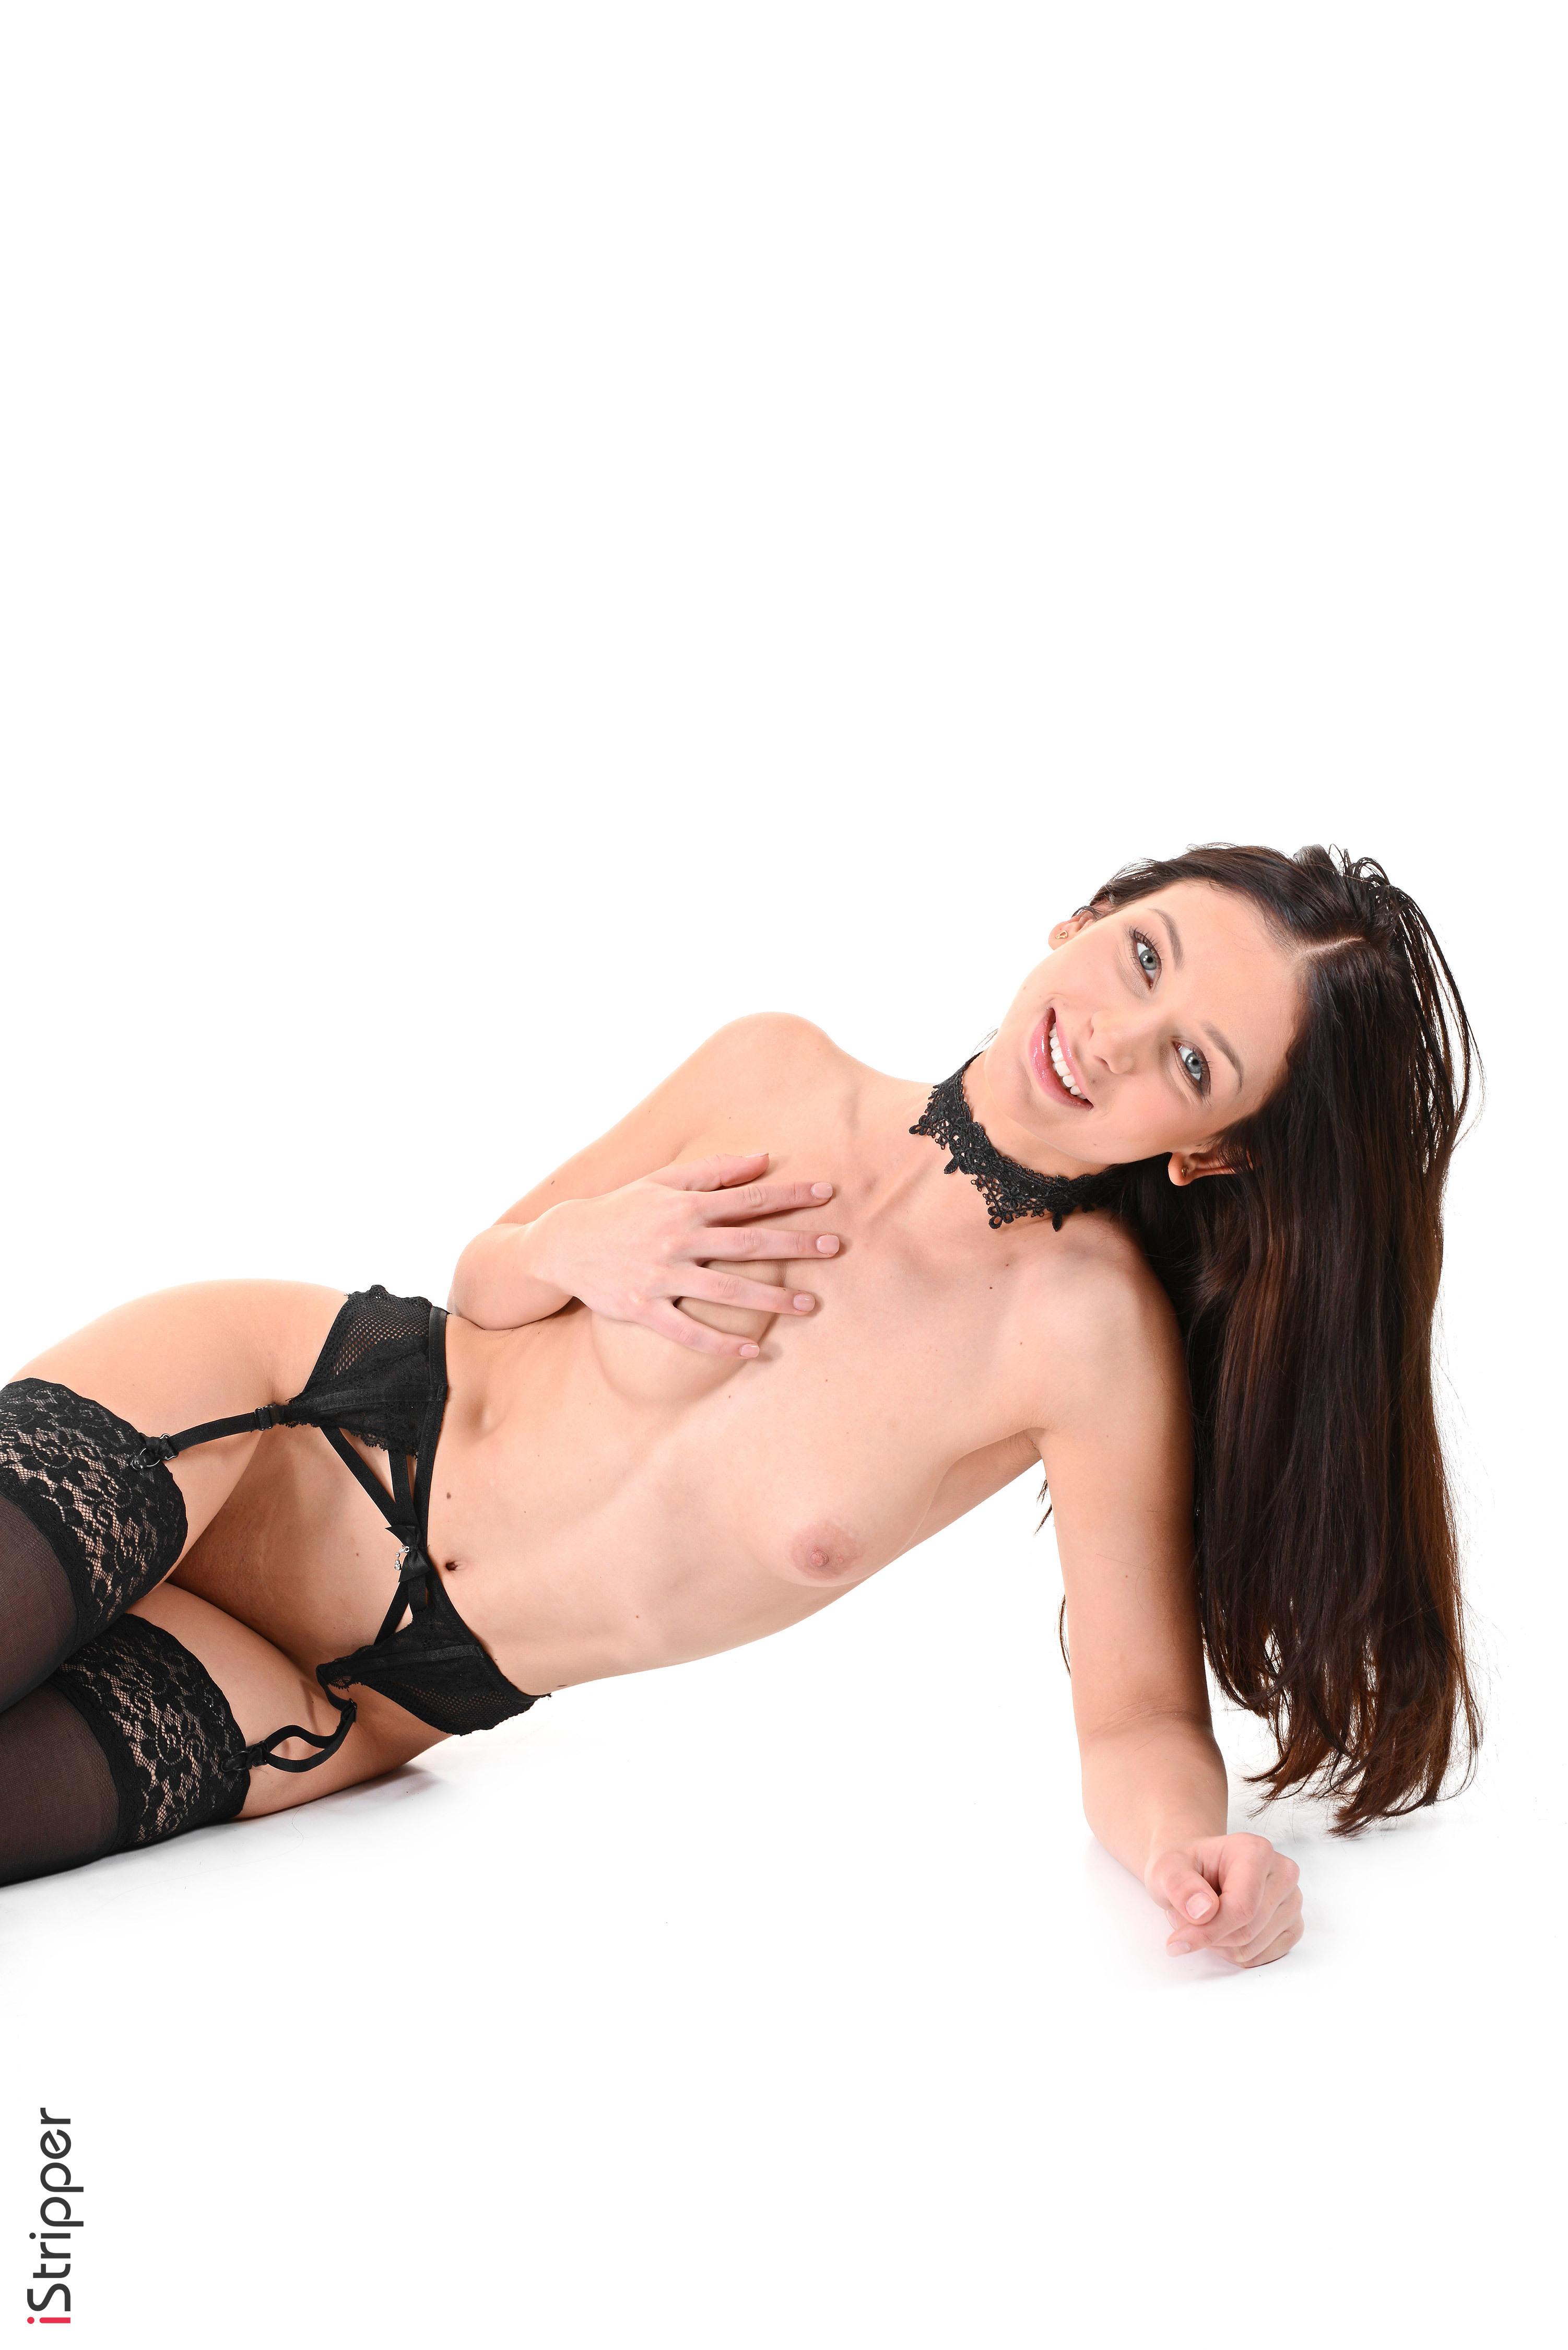 hot nude women wallpaper